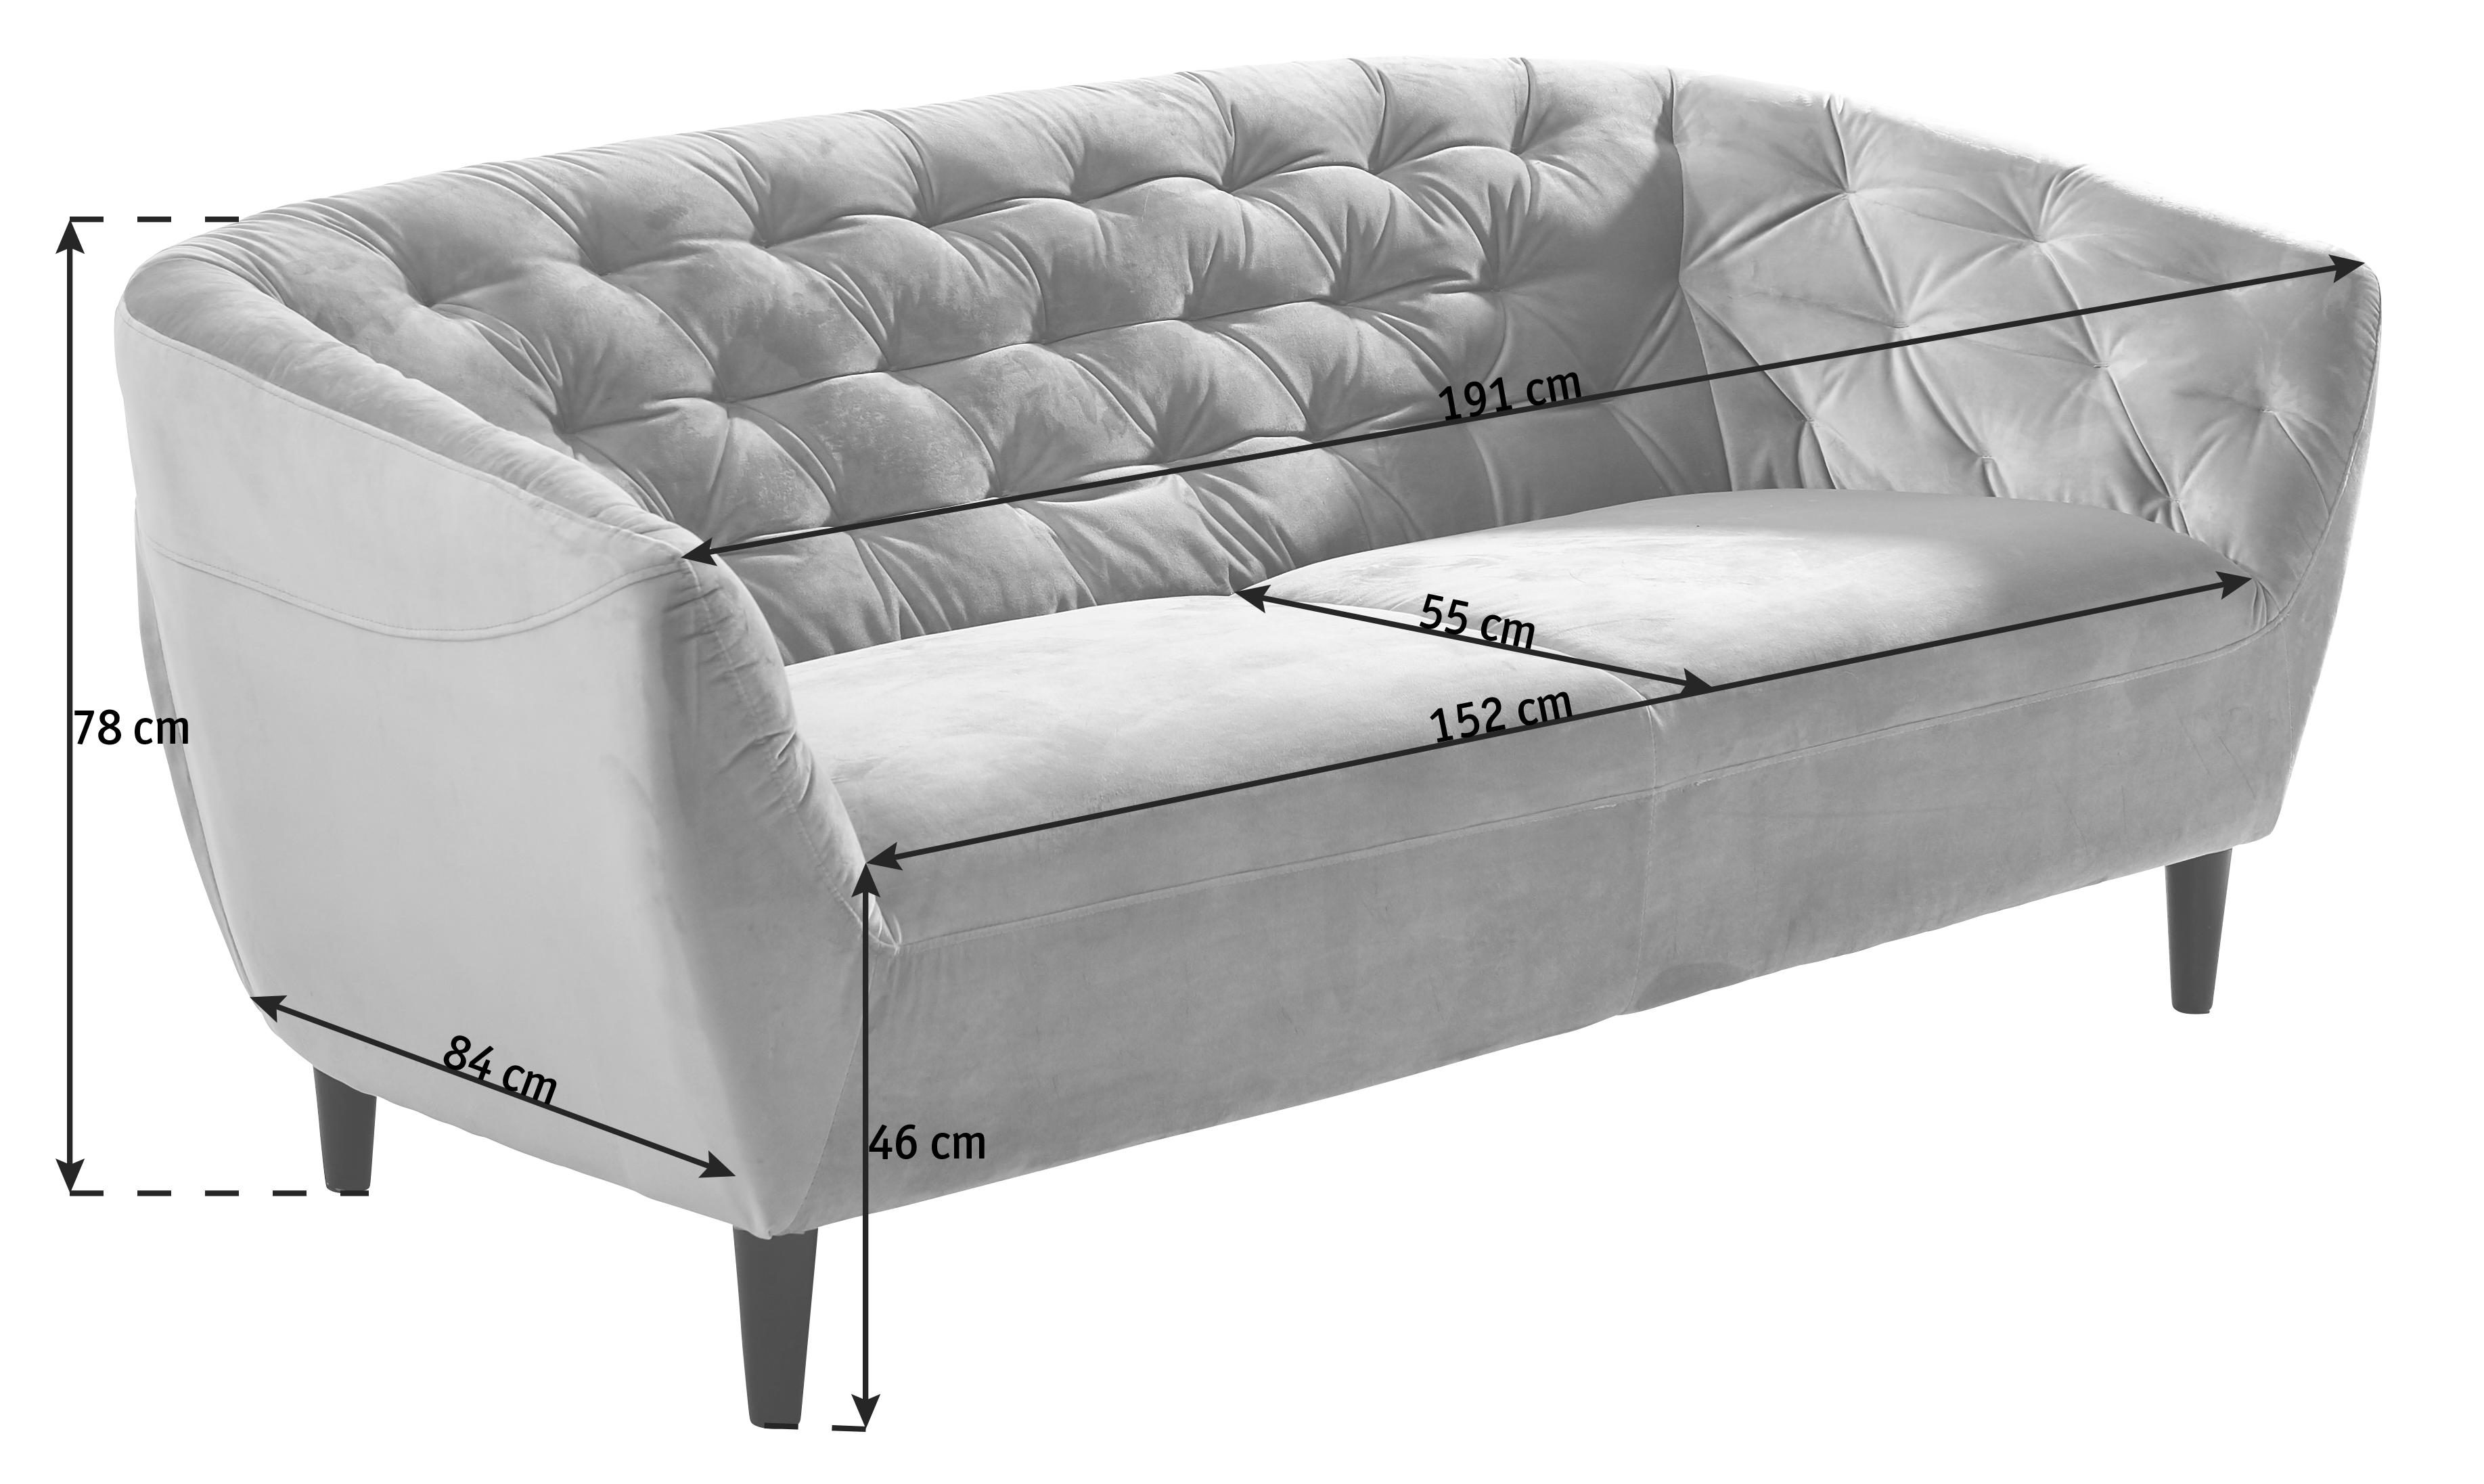 CHESTERFIELD-SOFFA - mörkgrå/svart, Trend, trä/textil (191/78/84cm) - Ambia Home